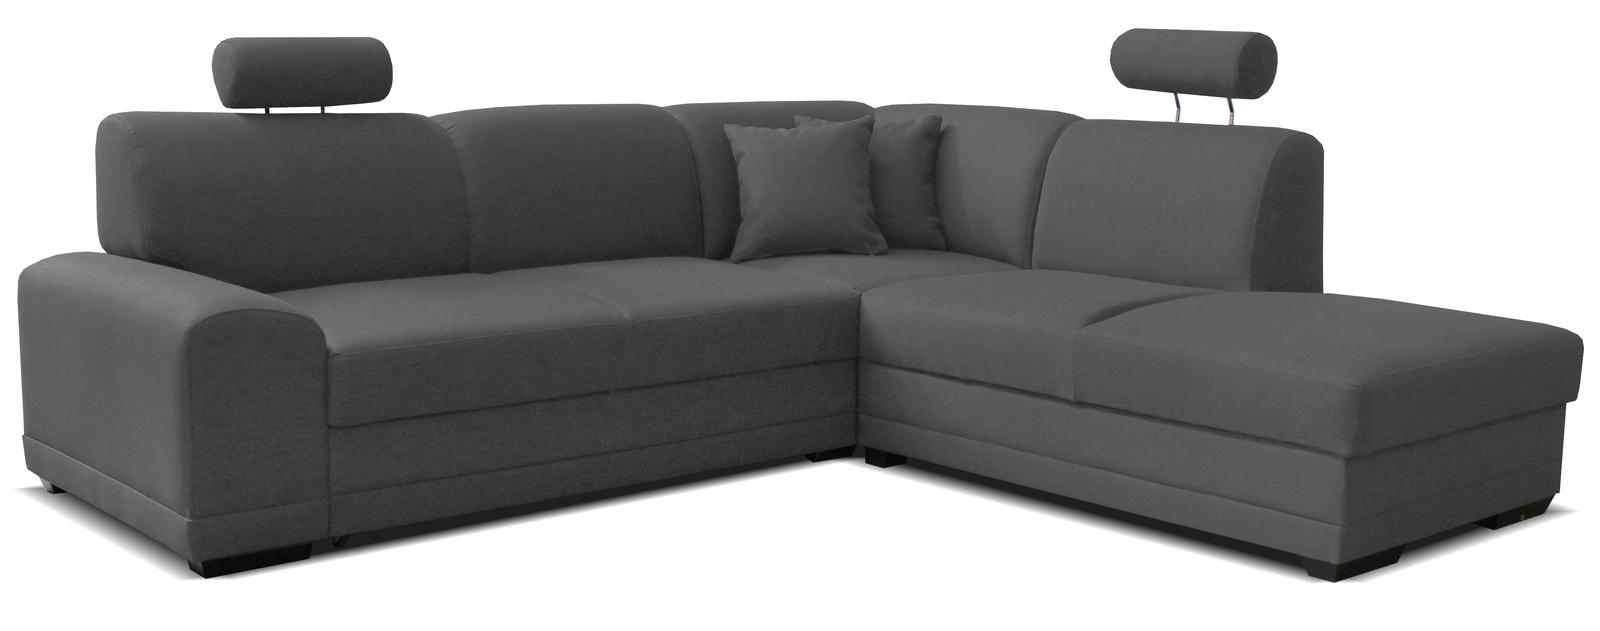 Rohová sedačka - Famm - Laon II 2F+L (P) tmavosivá